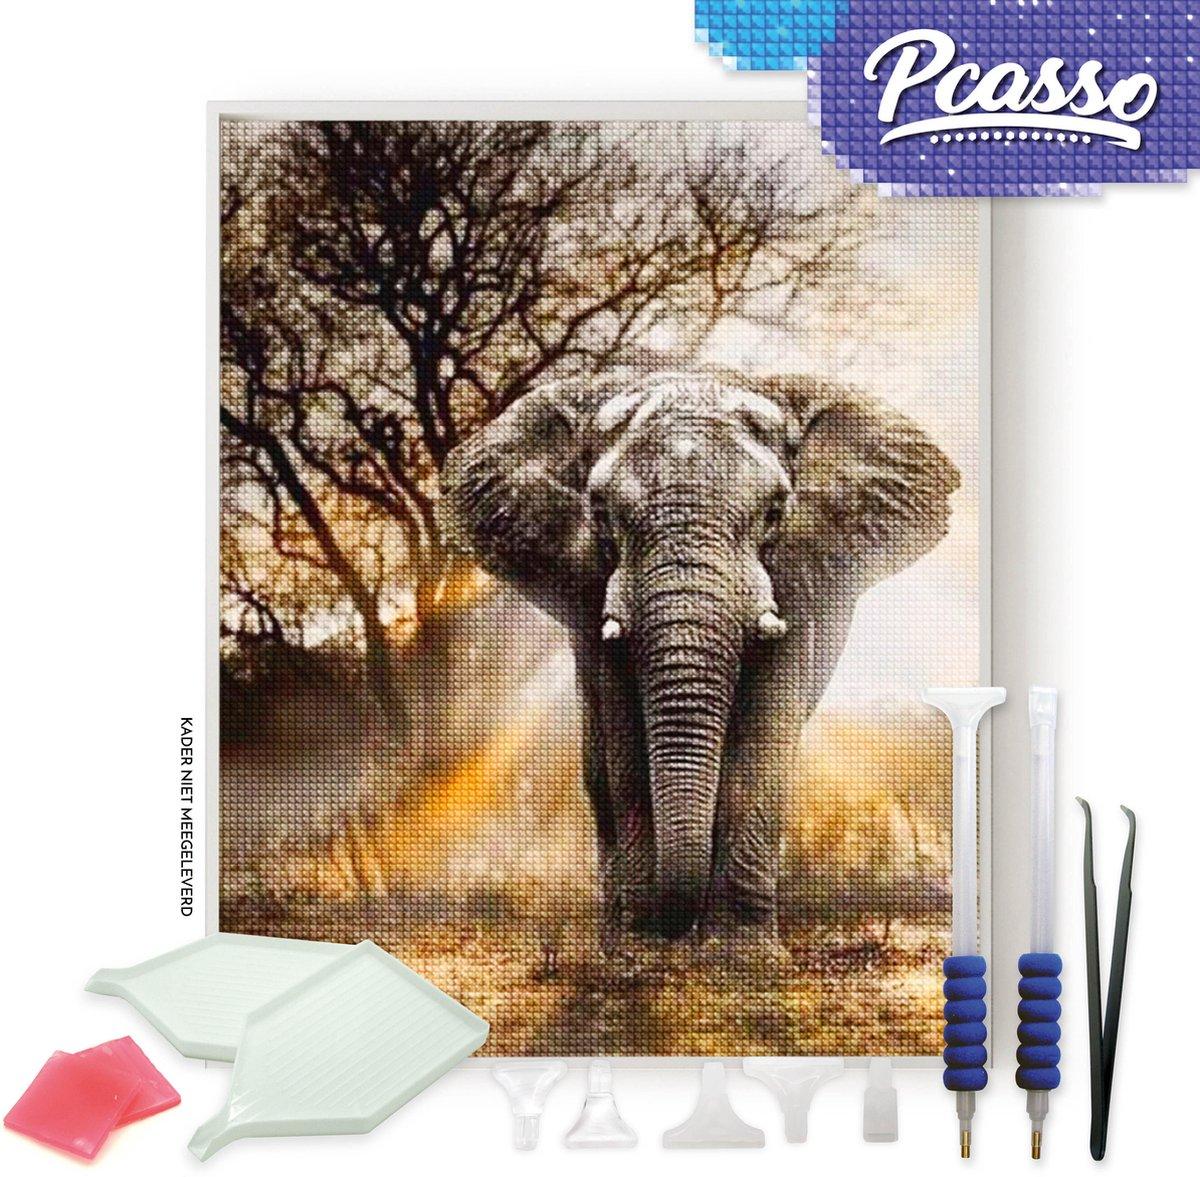 Pcasso ® Olifant Wild - Diamond Painting - Incl. Veel Diamond Painting Accessoires - Diamond Painting Kinderen - Diamond Painting Dieren - Diamond painting volwassenen - 30x40 CM